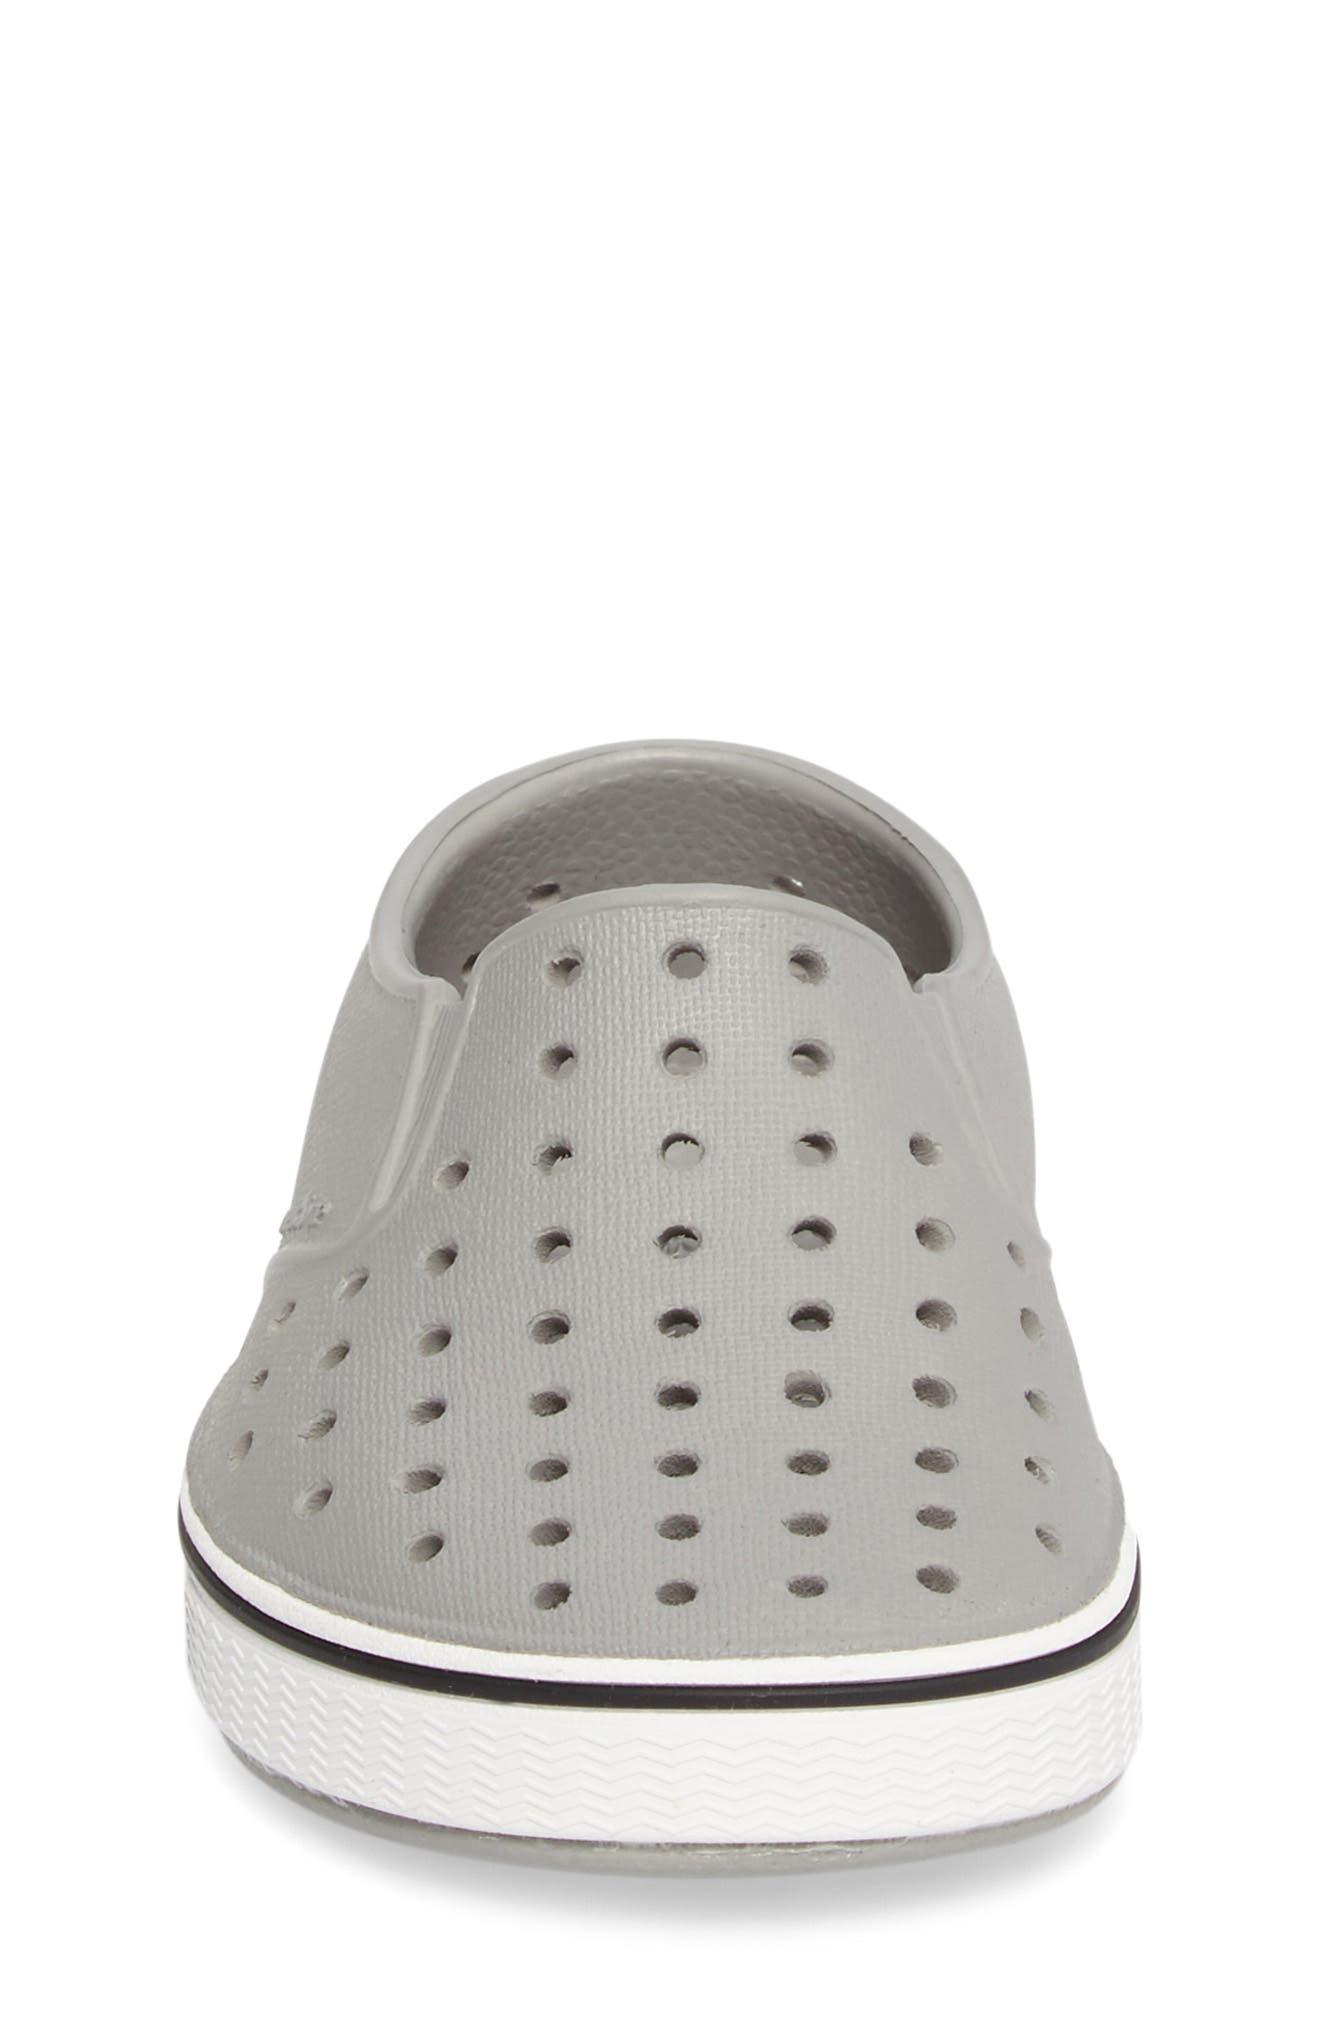 Miles Water Friendly Slip-On Sneaker,                             Alternate thumbnail 4, color,                             Pigeon Grey/ Shell White